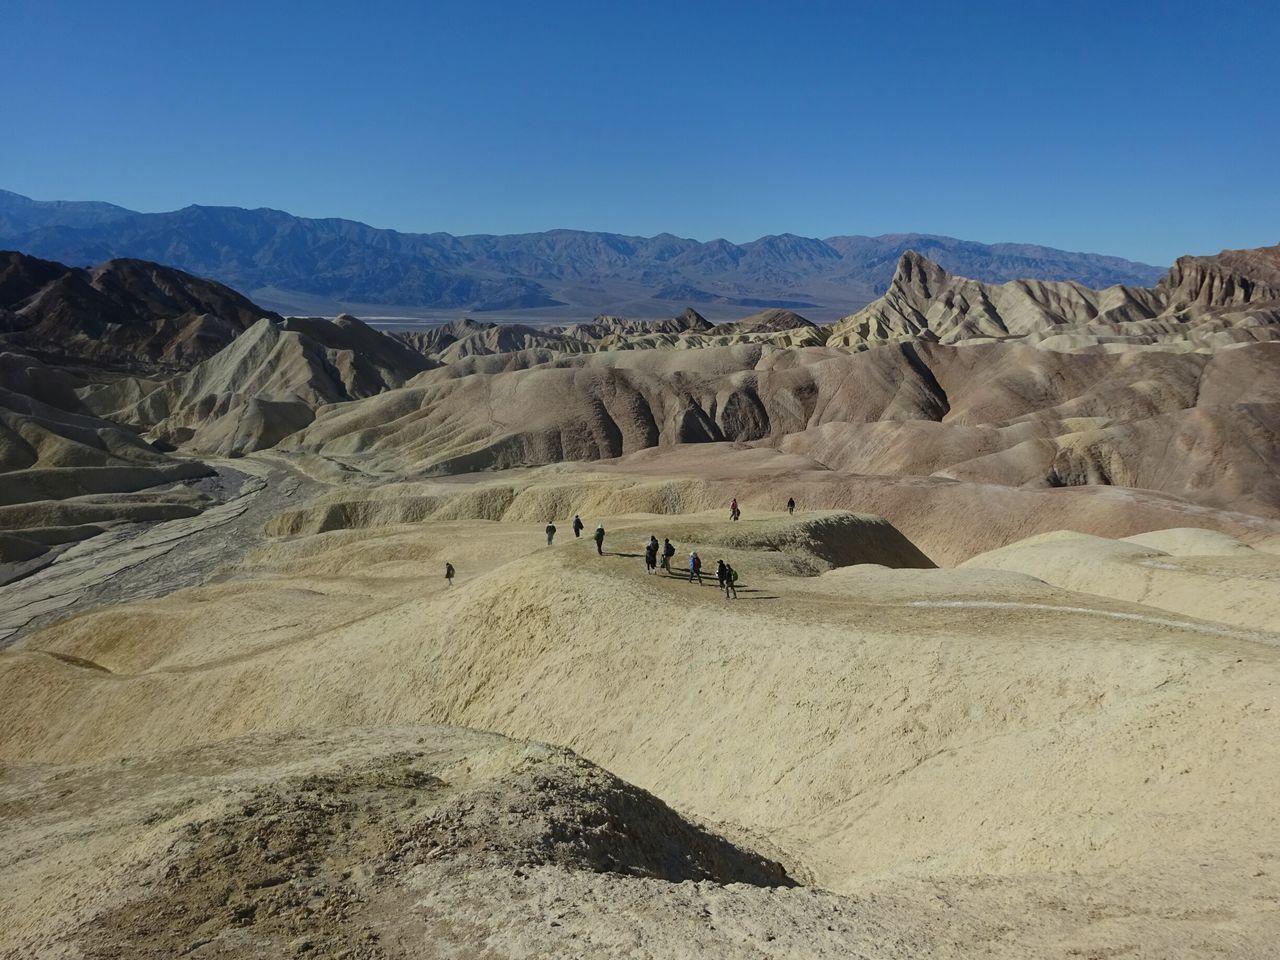 Field School 2016 Death Valley National Park SoftRock Landscape Mountains Basinandrange